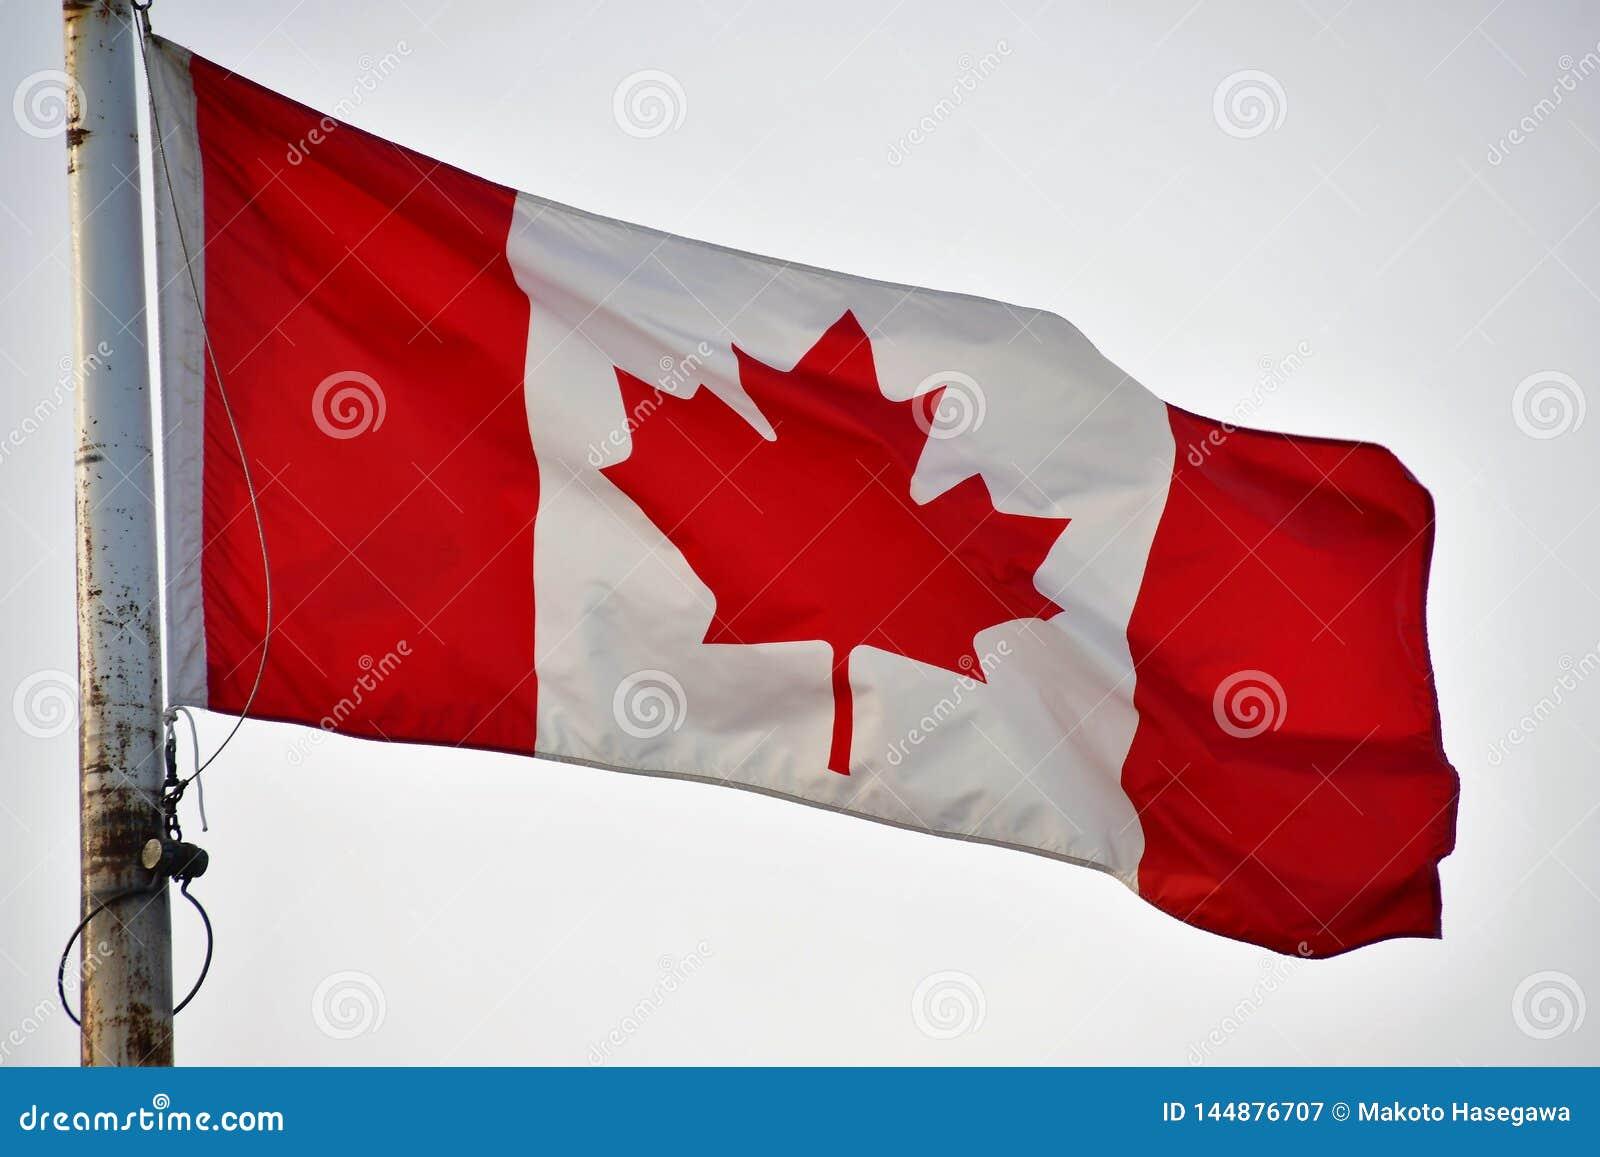 Die Kanada-Flagge bewegt in den Himmel wellenartig